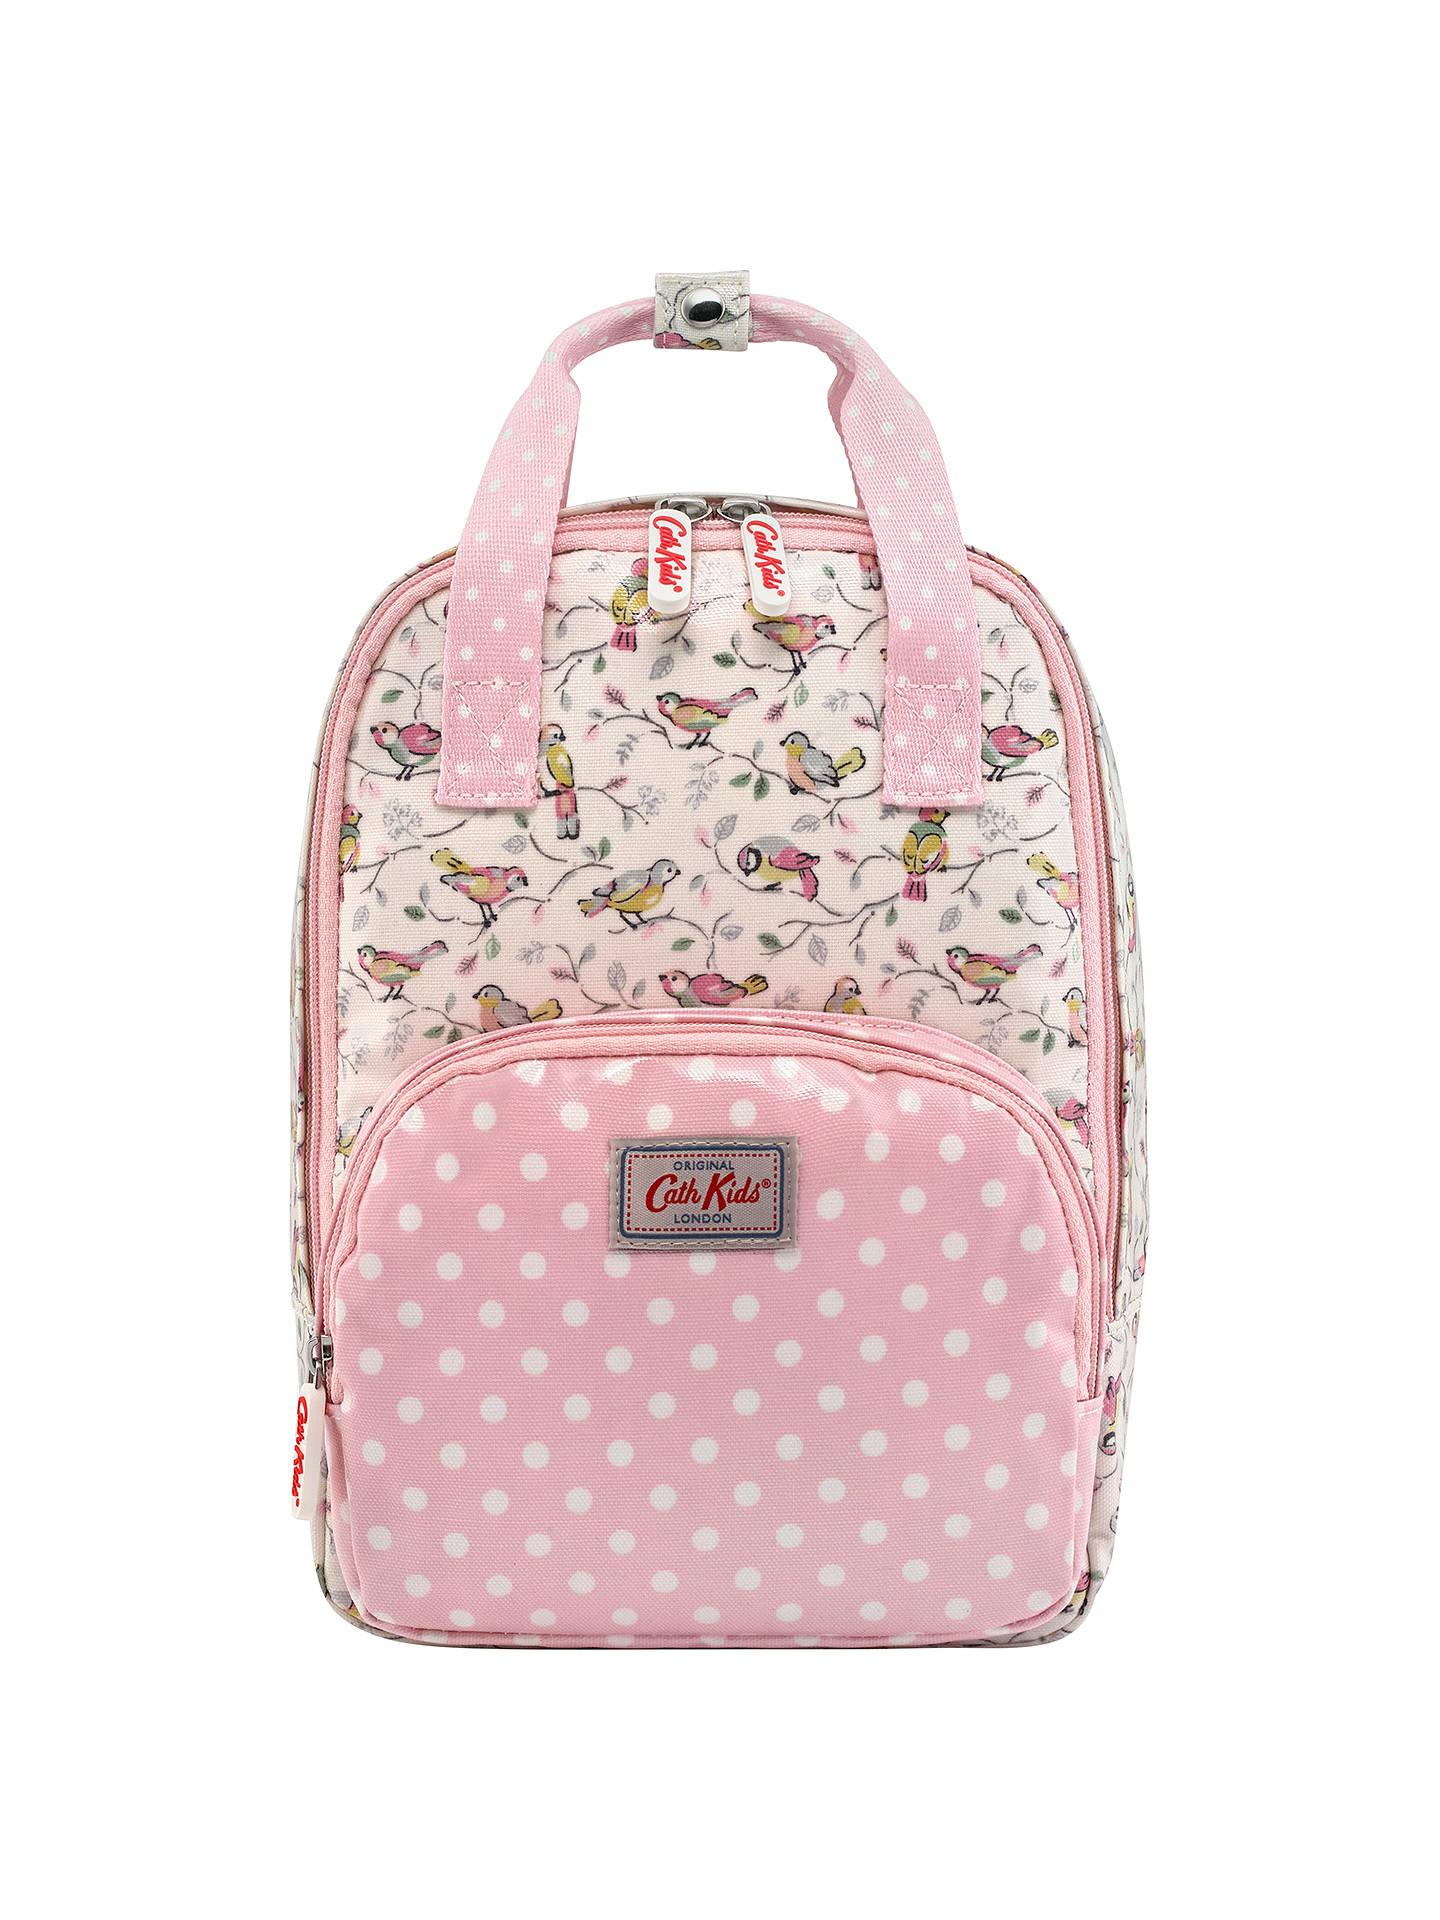 shop best sellers latest sale outstanding features Cath Kids Children's Little Birds Medium Backpack, Pink